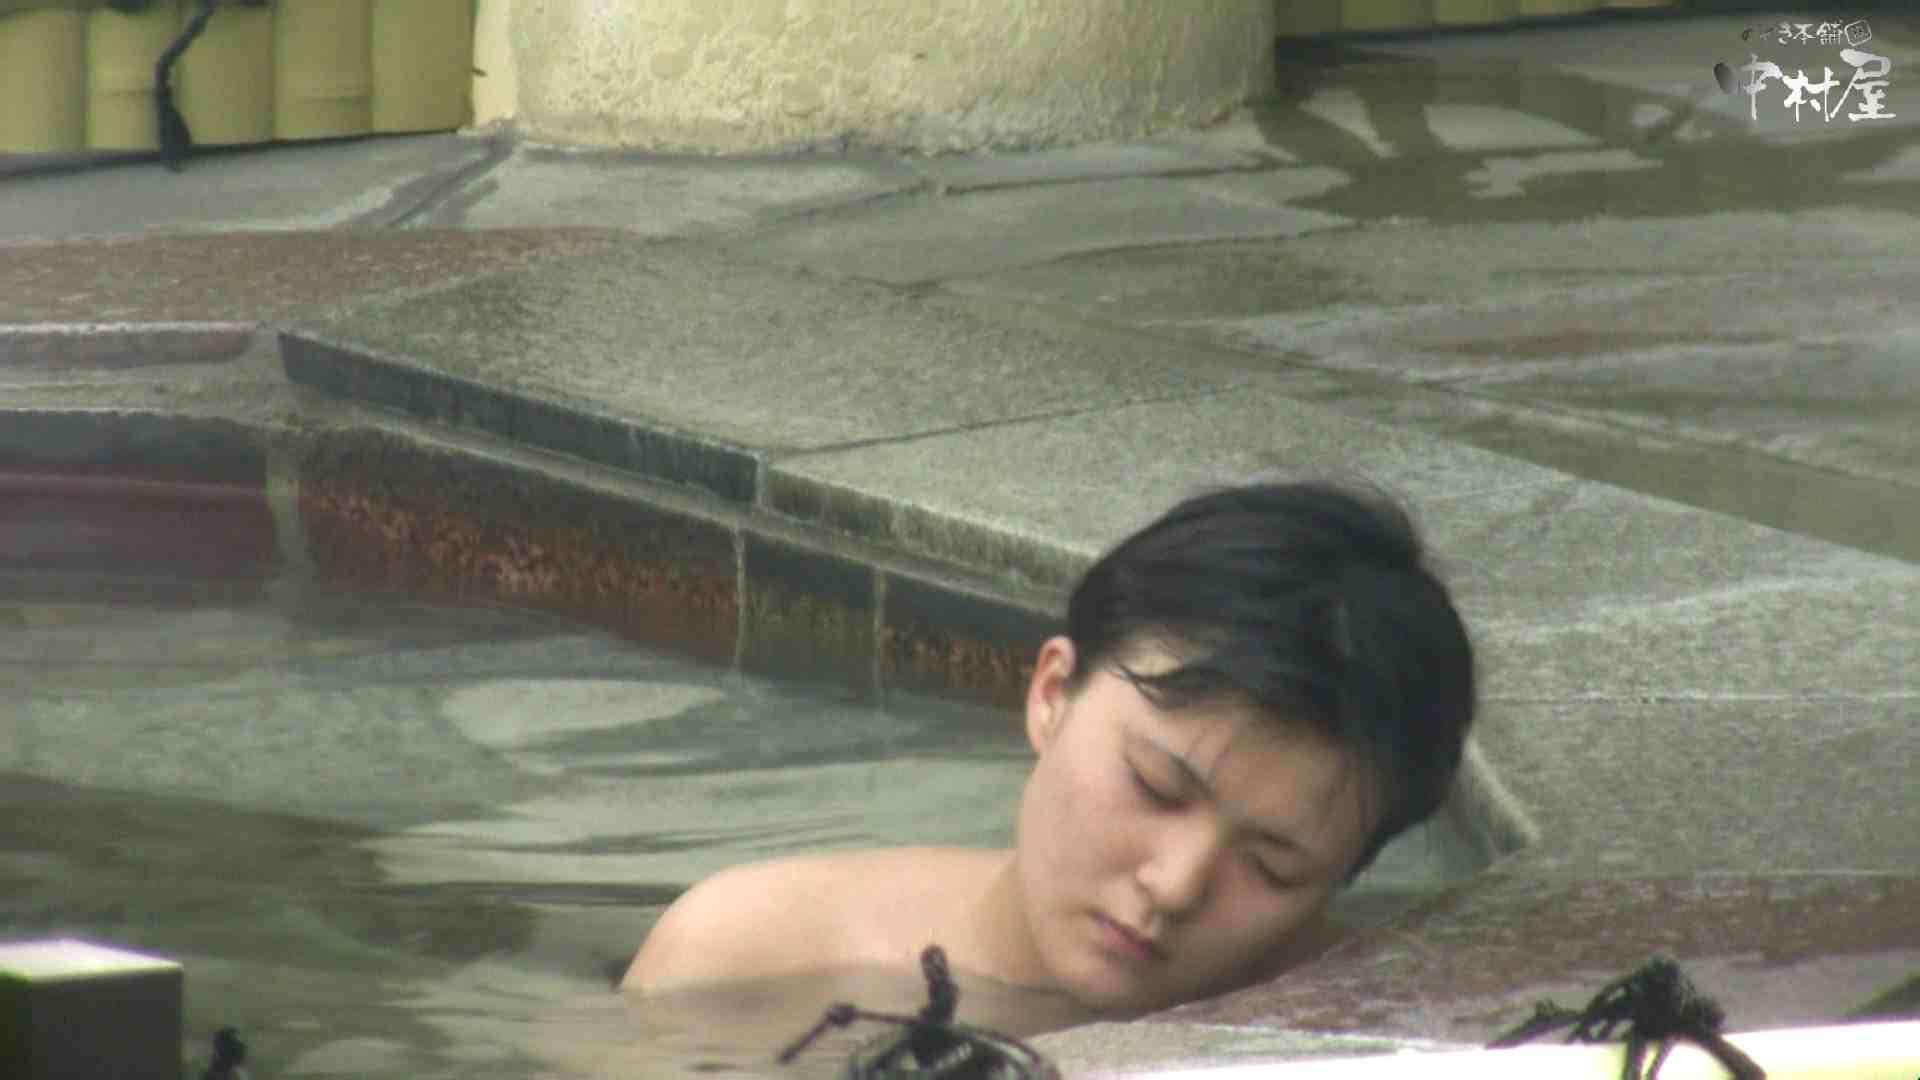 Aquaな露天風呂Vol.894 盗撮大放出 セックス画像 67連発 19